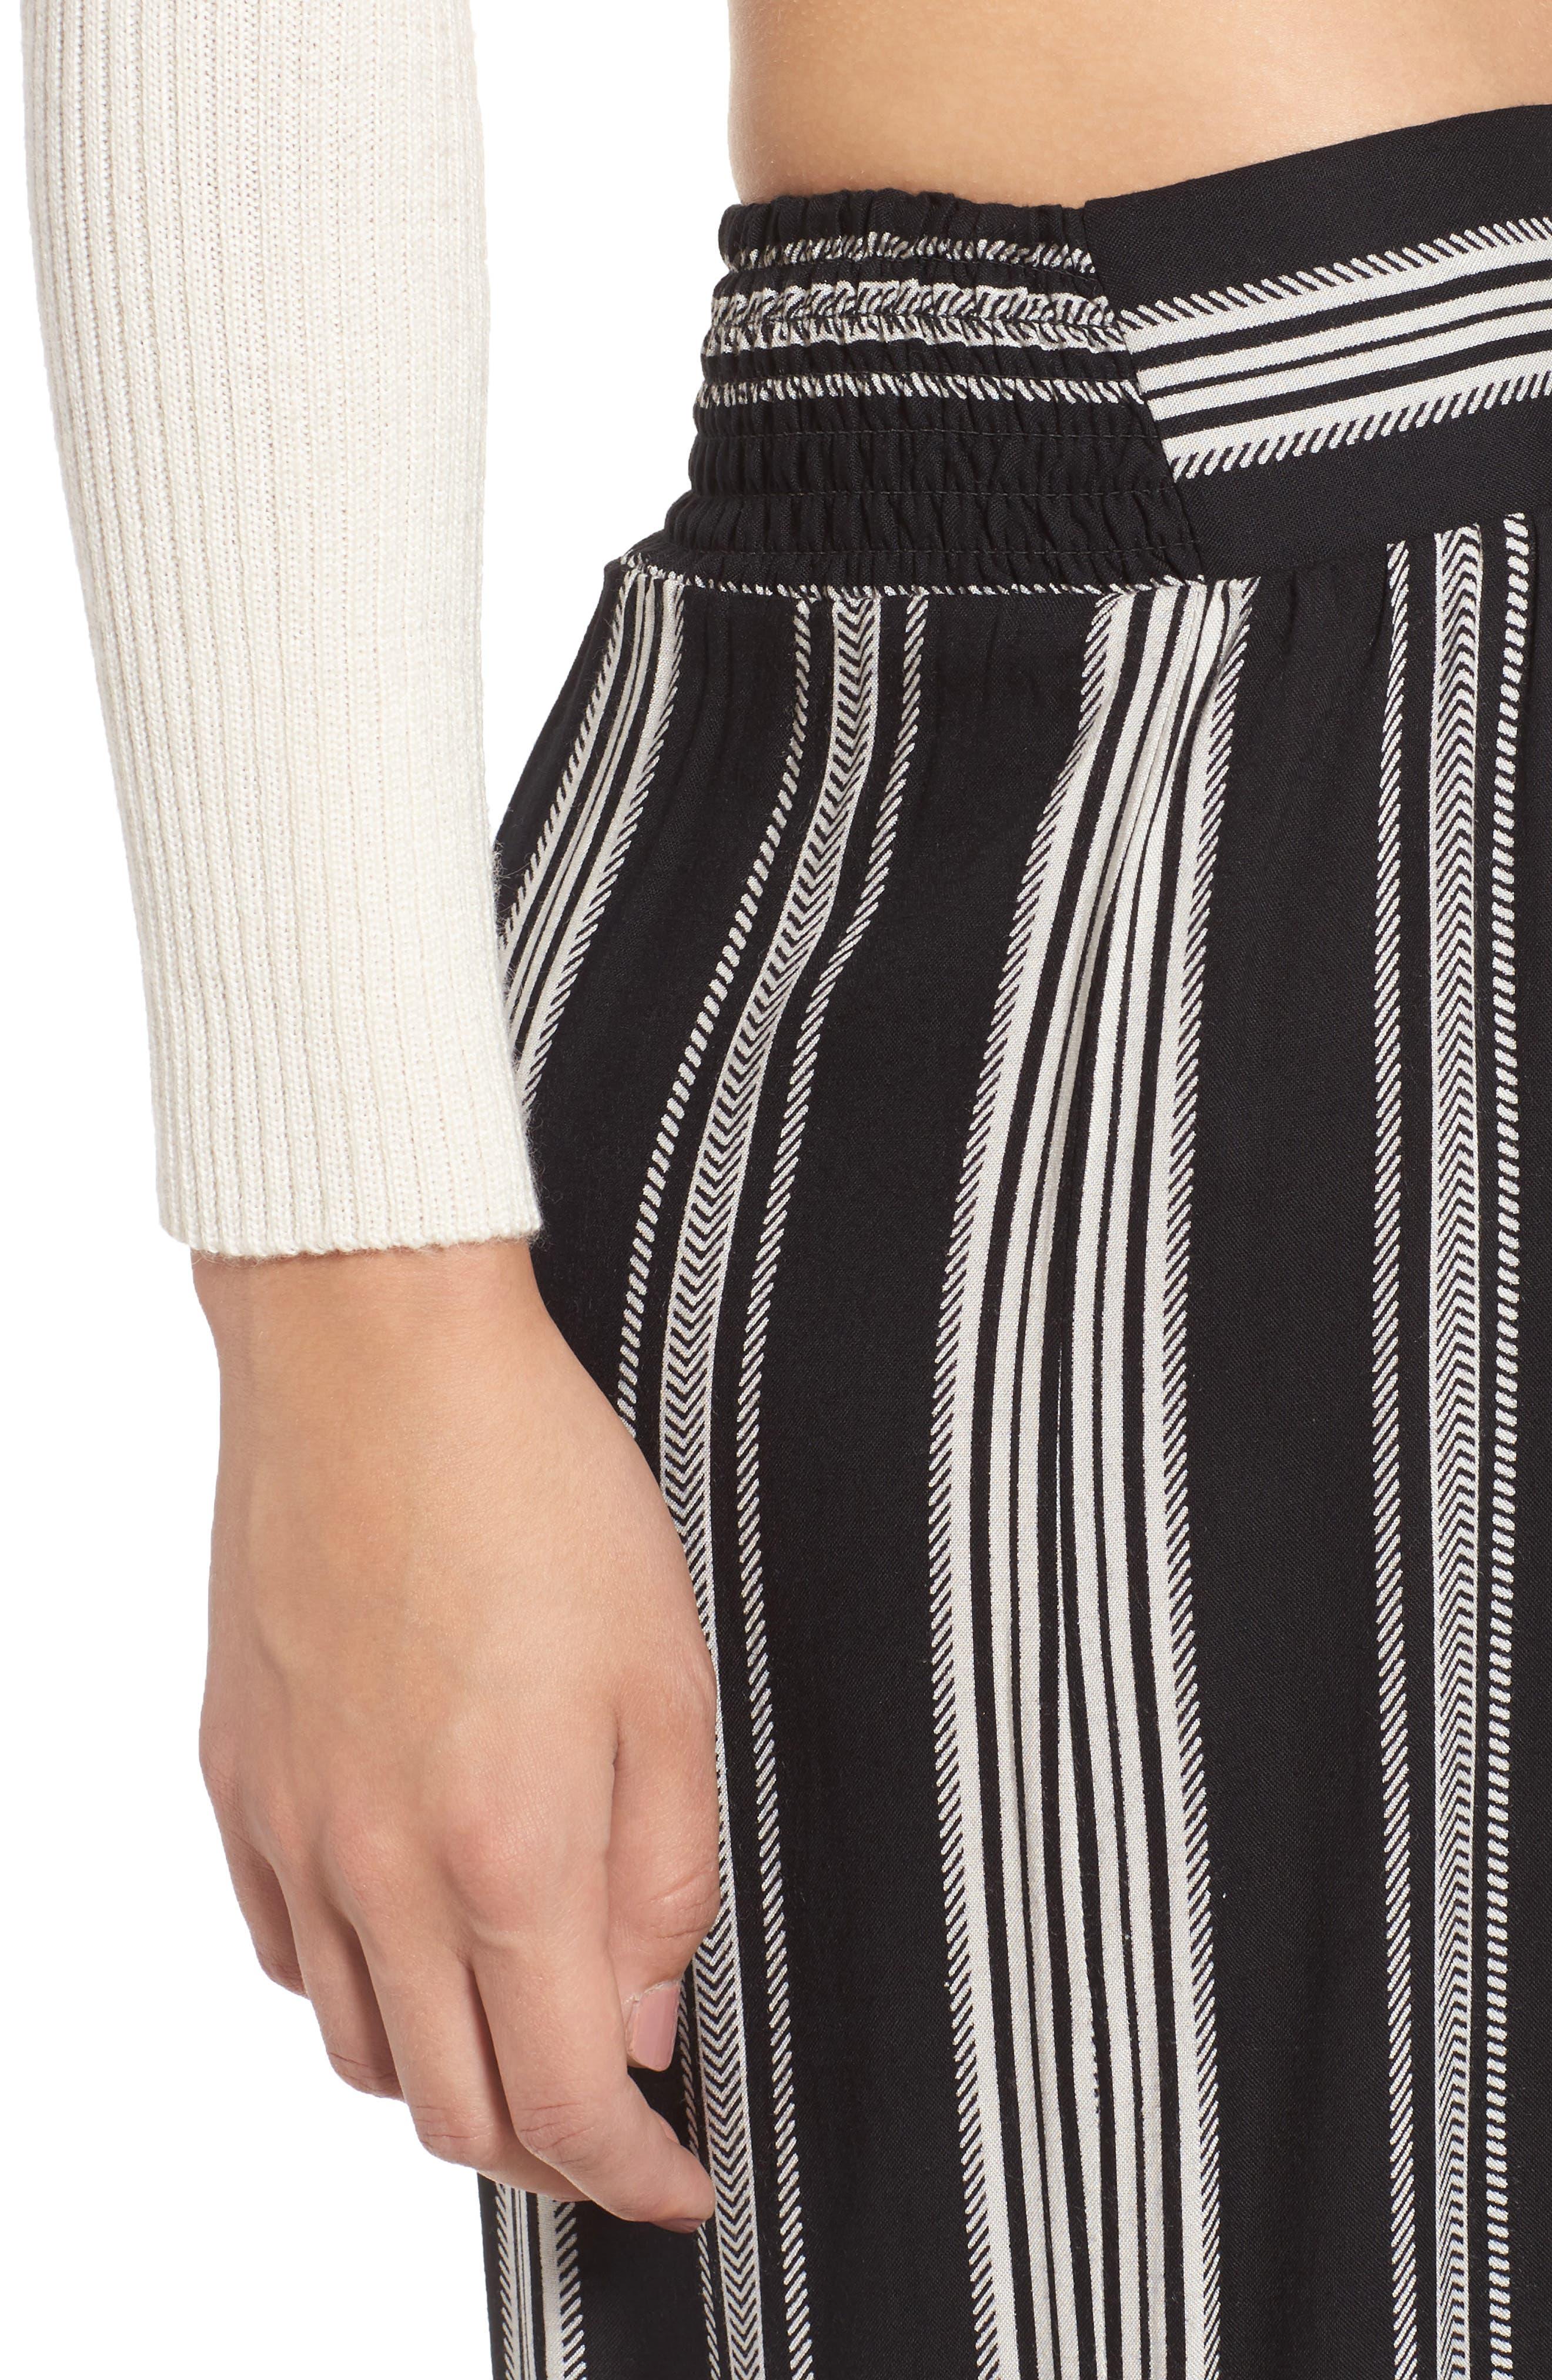 Herringbone Wide Leg Pants,                             Alternate thumbnail 4, color,                             887R-Black/ Ivory